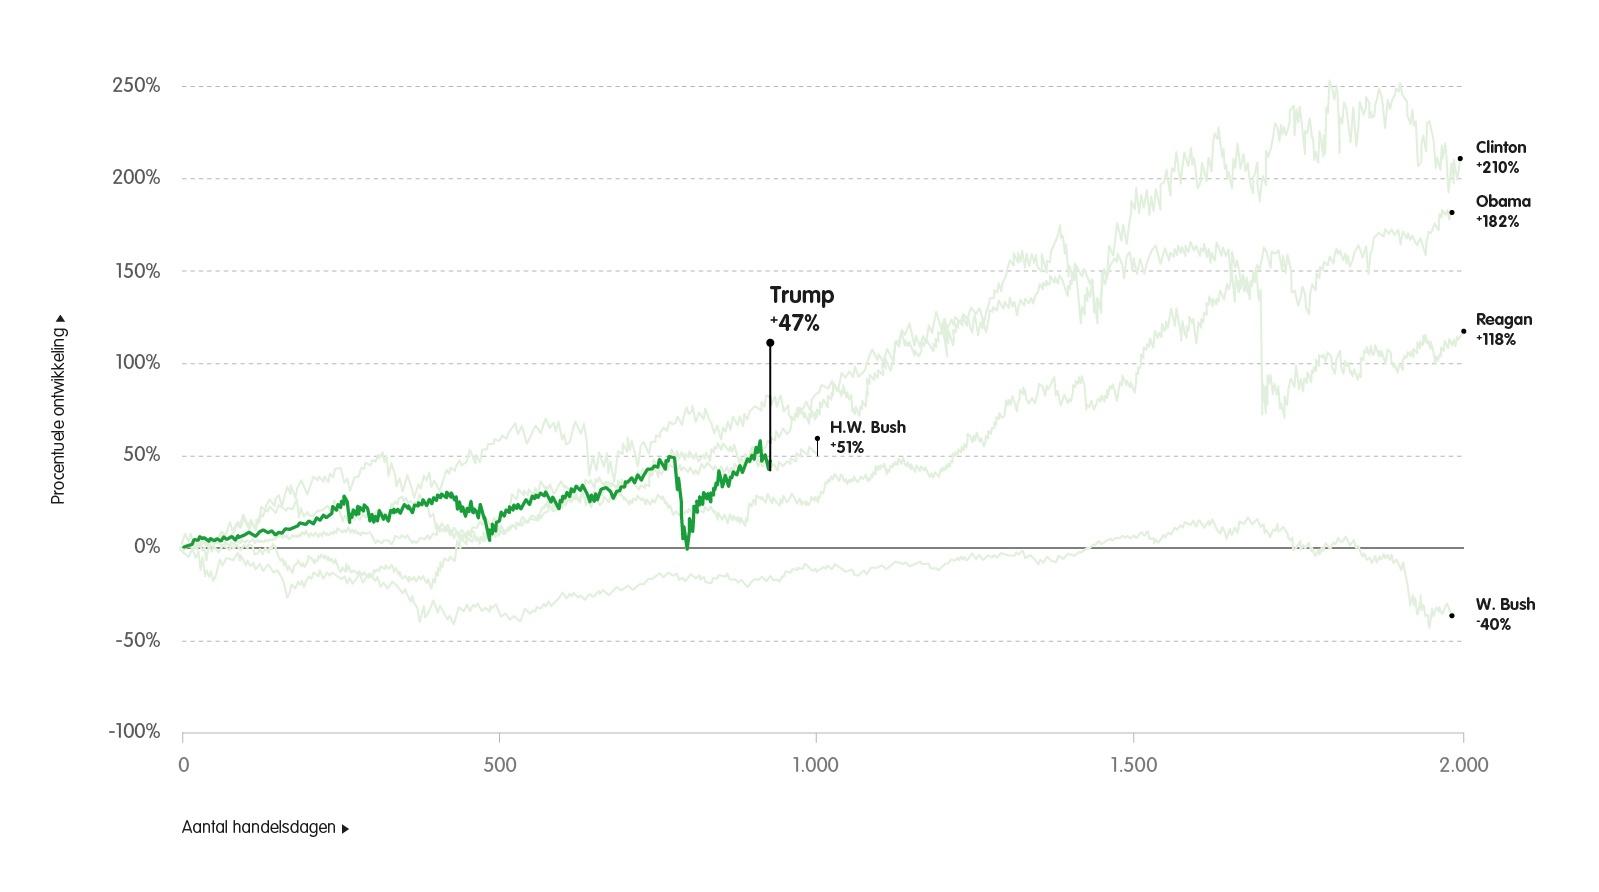 Koersontwikkeling S&P 500 onder Trump en andere Amerikaanse presidenten